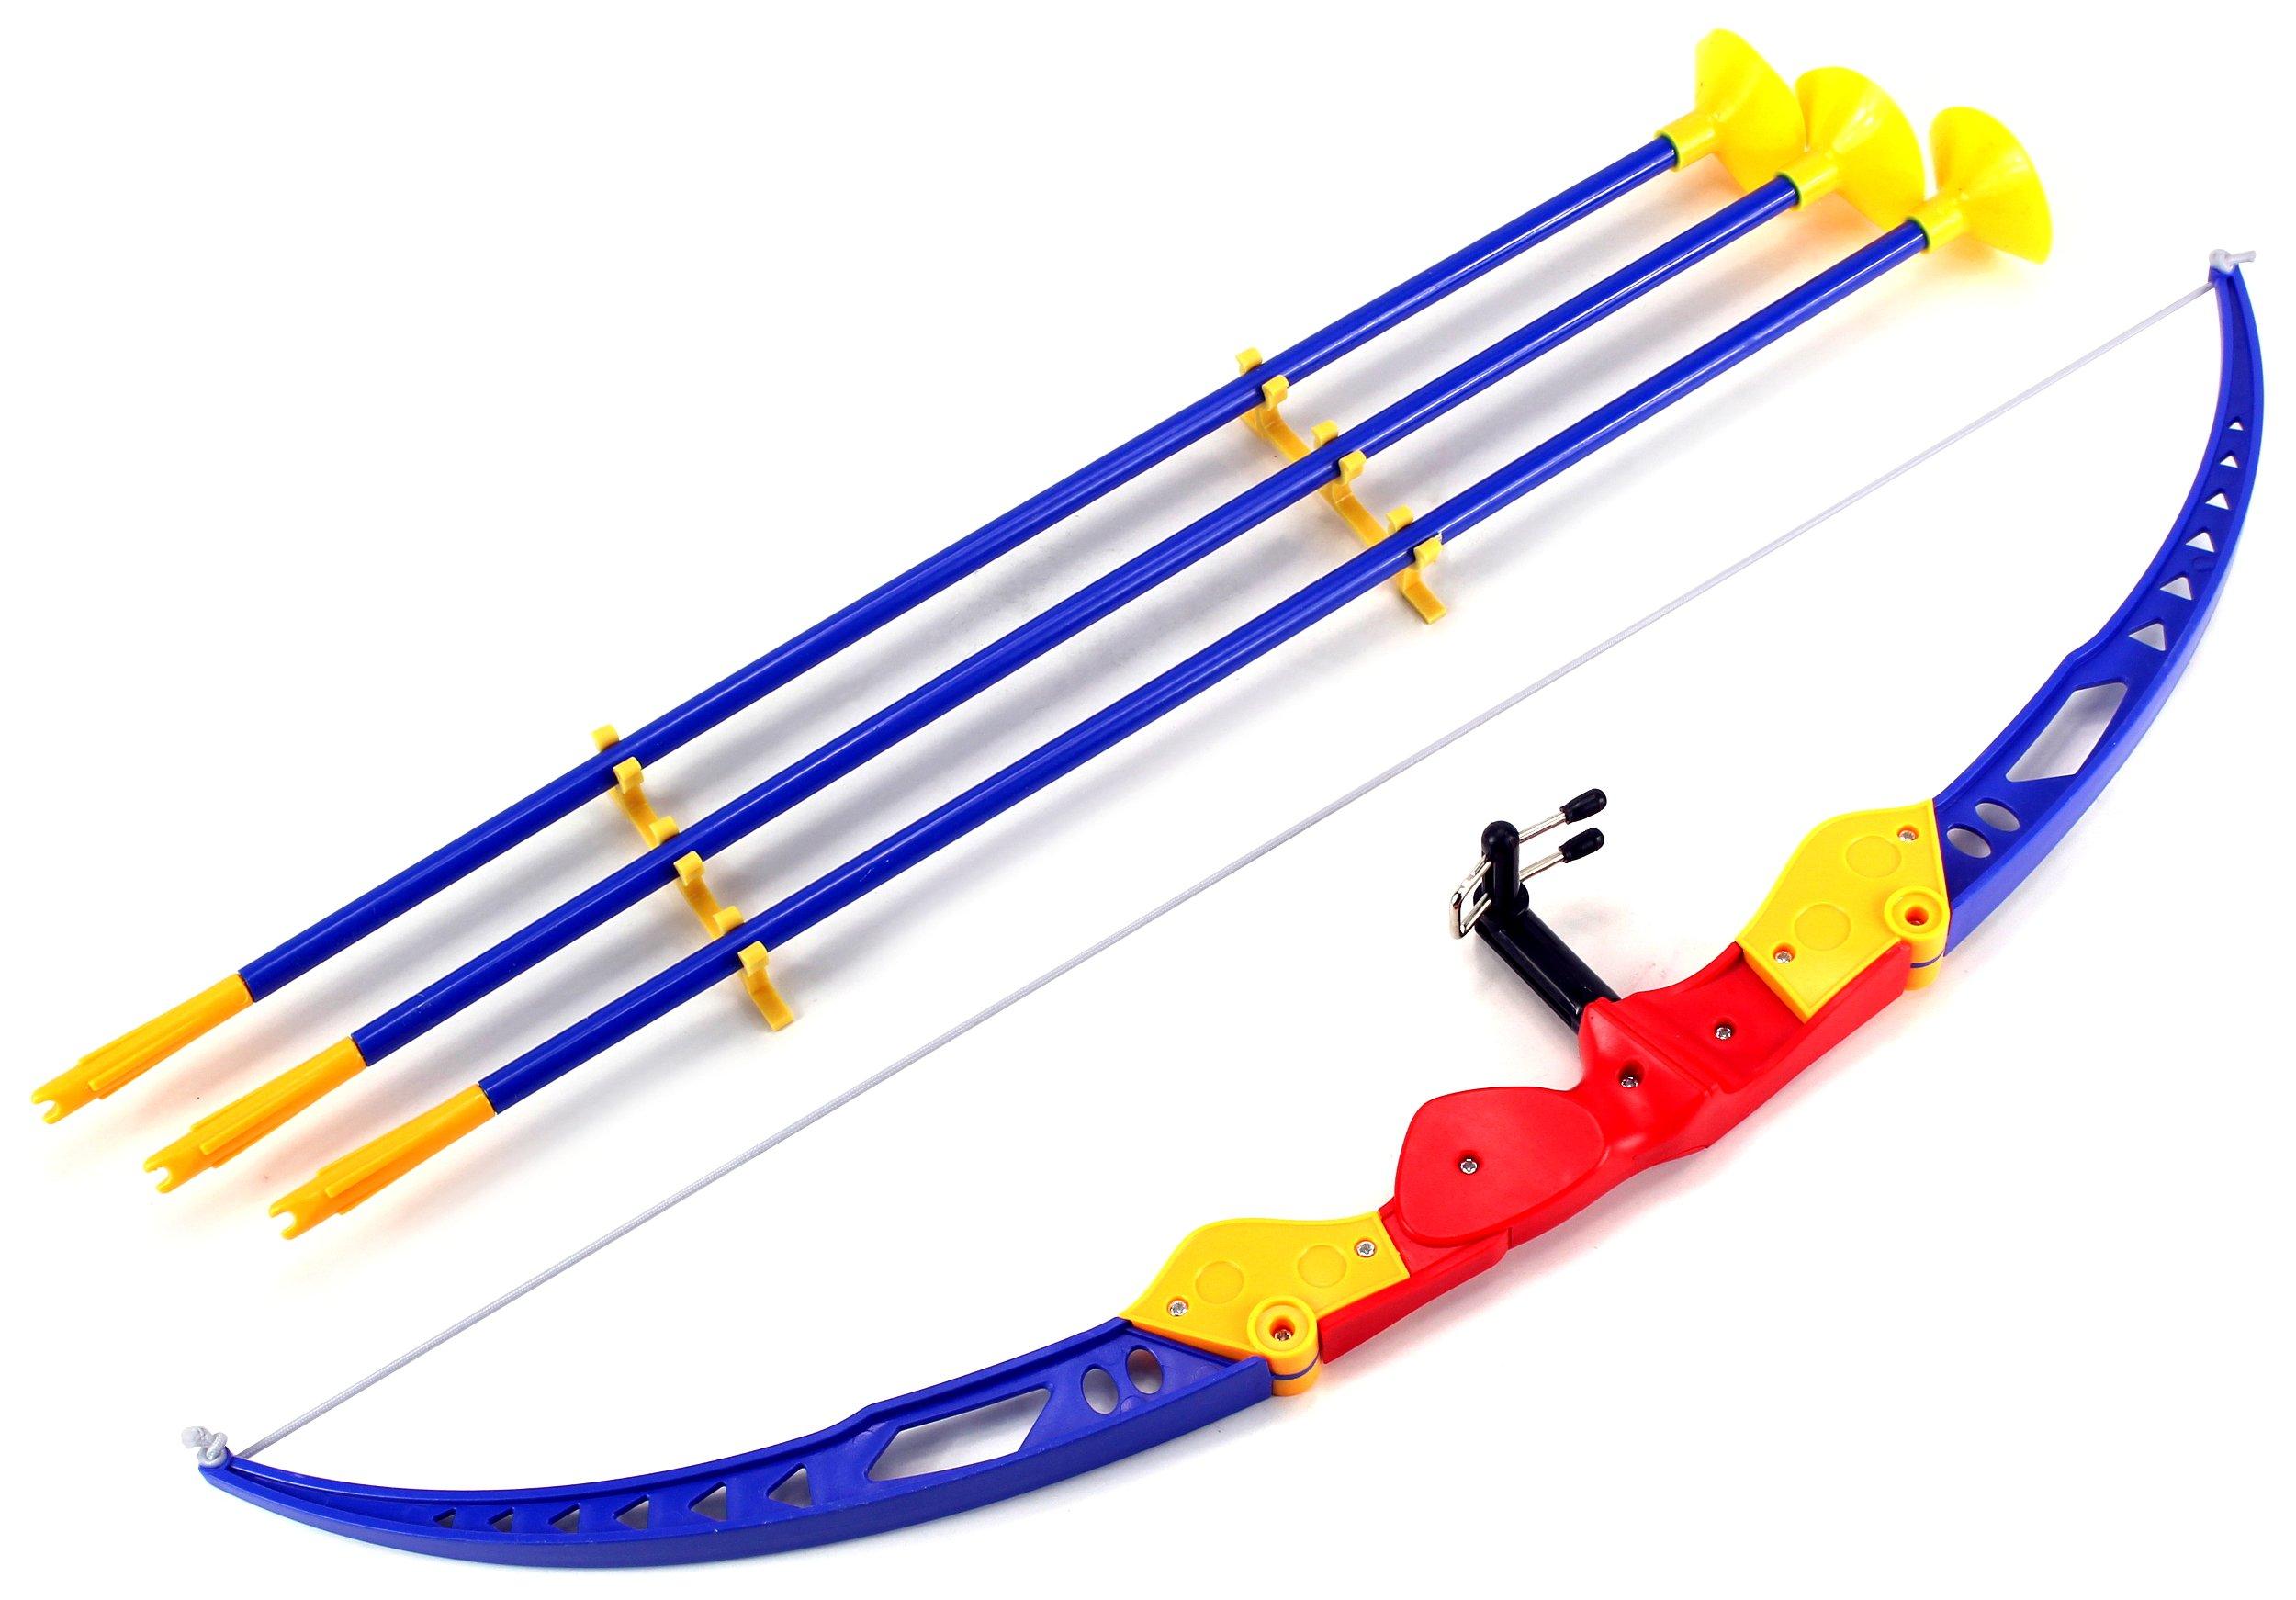 Sport Super Archery '51-1 Children's Kid's Toy Bow and Arrow Dart Playset w/ Suction Dart Arrows